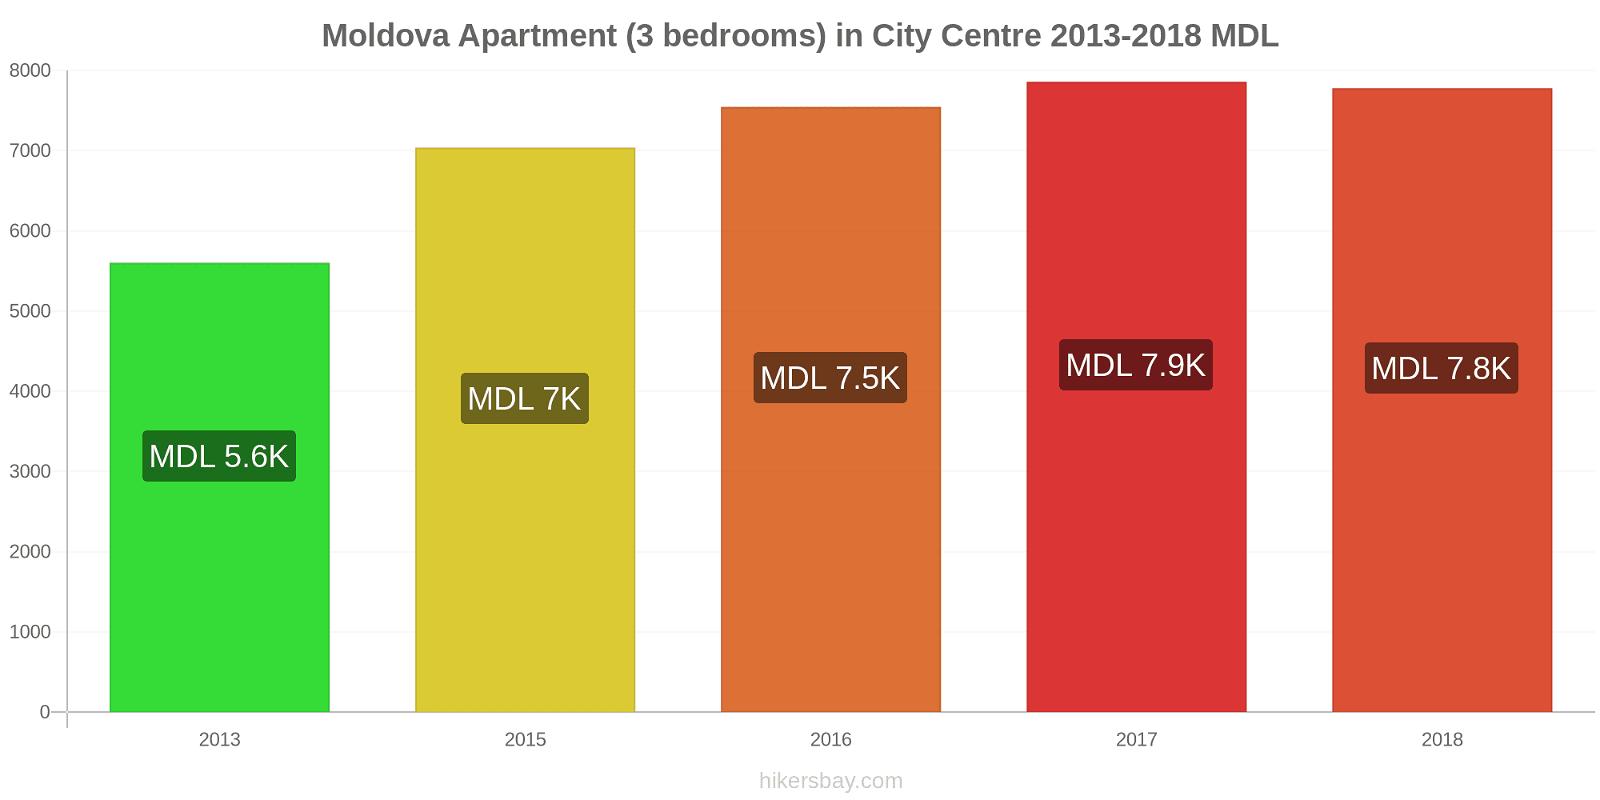 Moldova price changes Apartment (3 bedrooms) in City Centre hikersbay.com